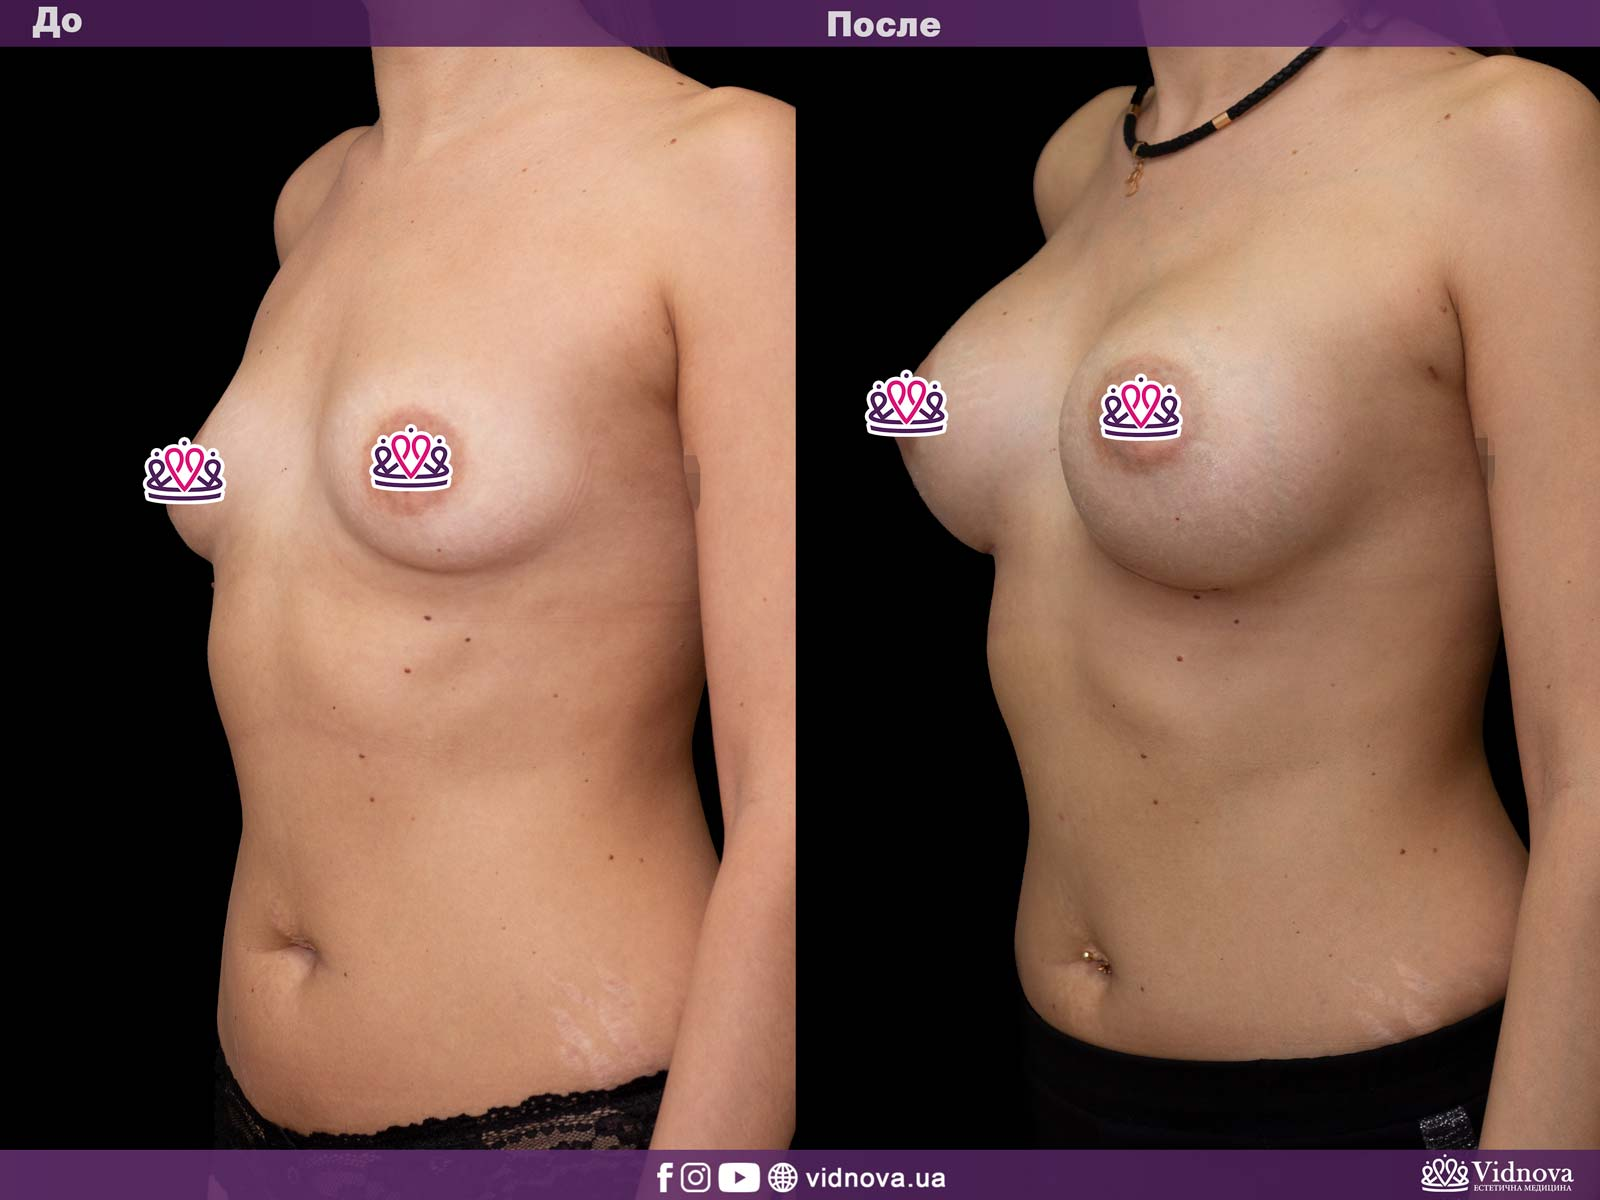 Увеличение груди: Фото ДО и ПОСЛЕ - Пример №13-2 - Клиника Vidnova